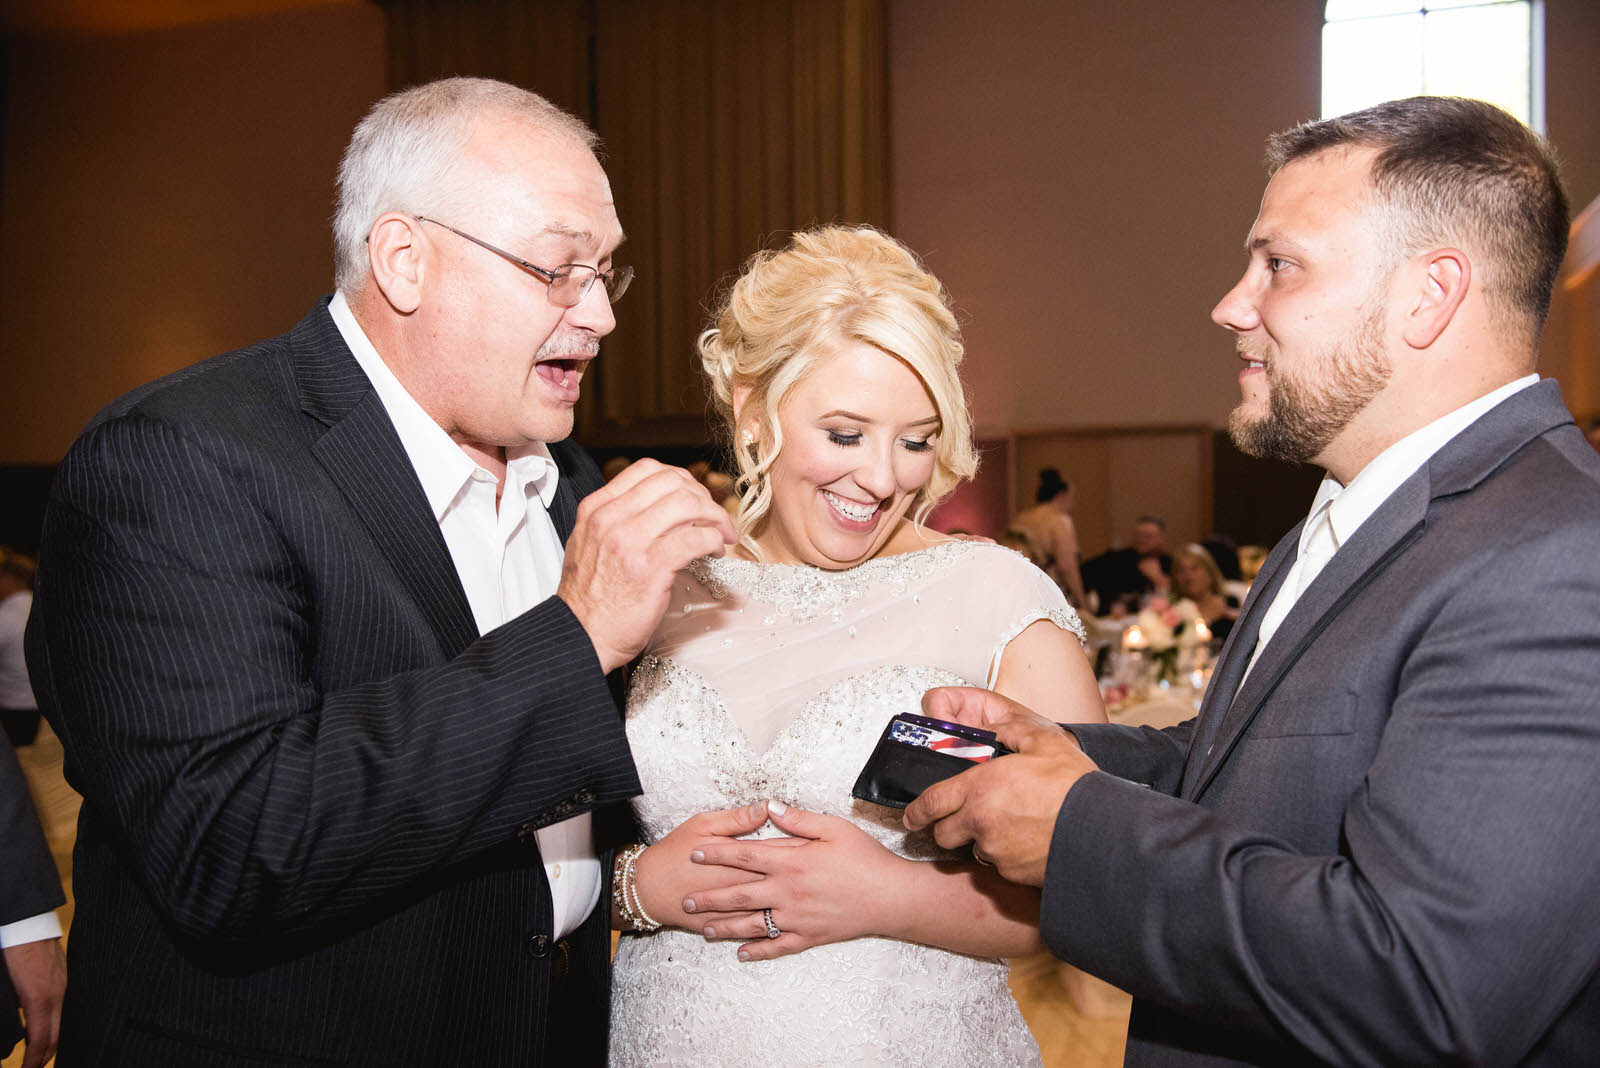 weddings-at-Holy-Cross-Greek-Orthodox-Church-and-Hall-28.jpg